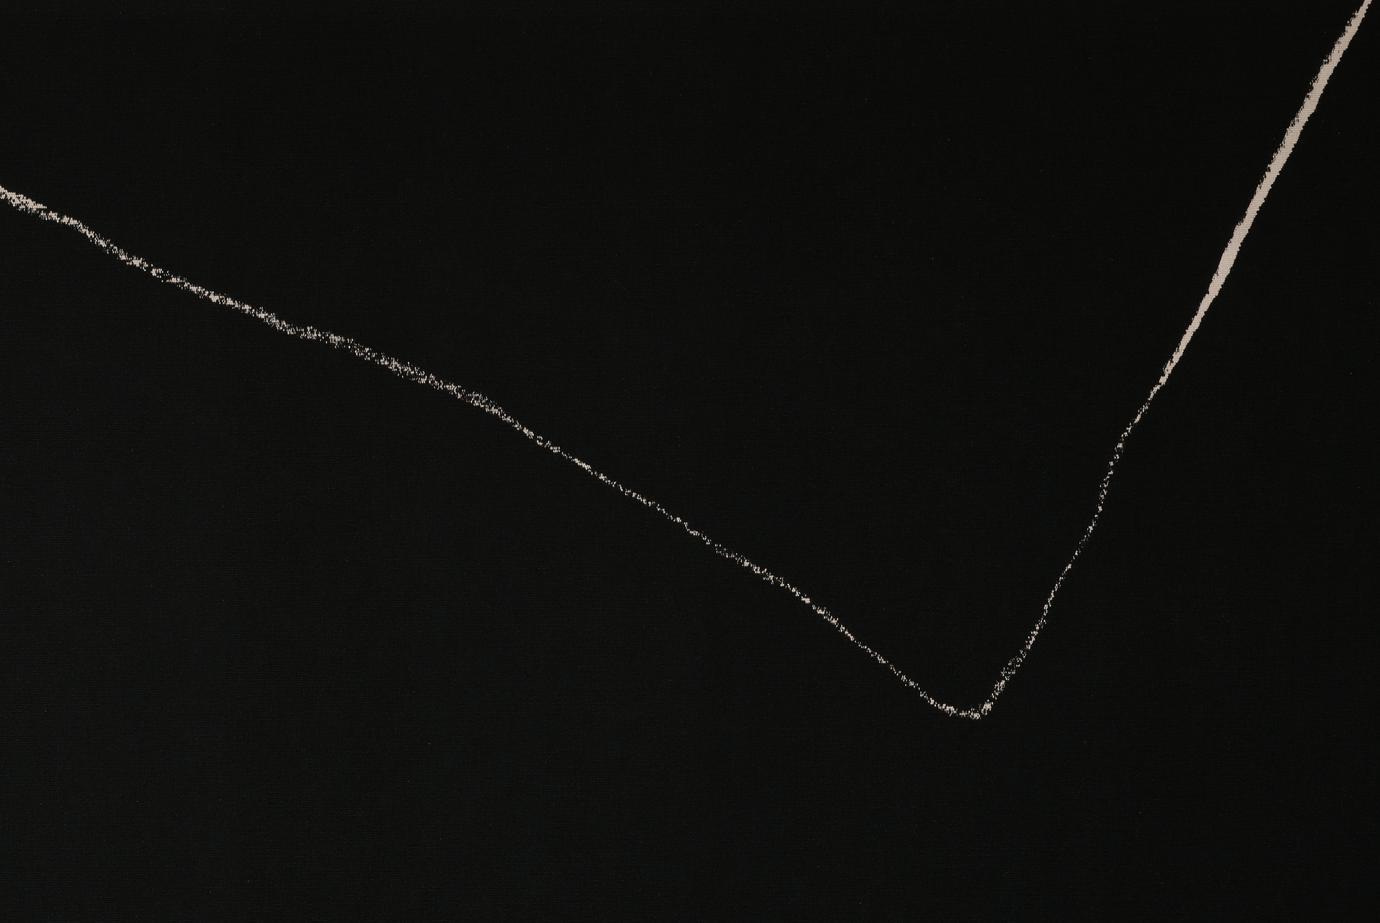 black ground; white V-shaped element on top half